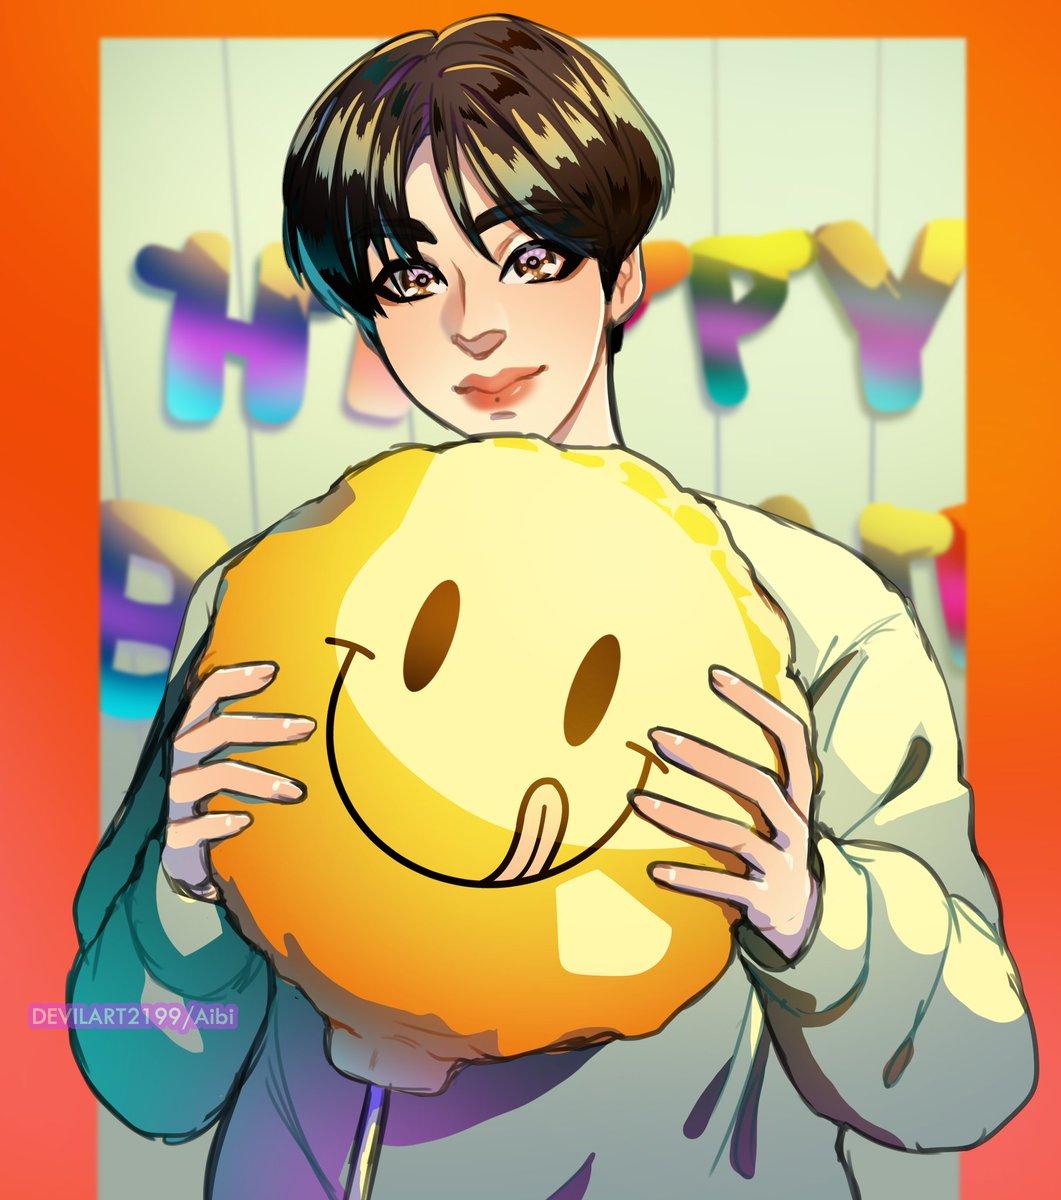 Happy Belated Birthday Wonnie 🐢🎂 #monstaxfanart #몬스타엑스 #HBDtoHYUNGWON#HYUNGWON #형원이란_다정함이_내린_날 #형원 #NobodyElseButHyungwon